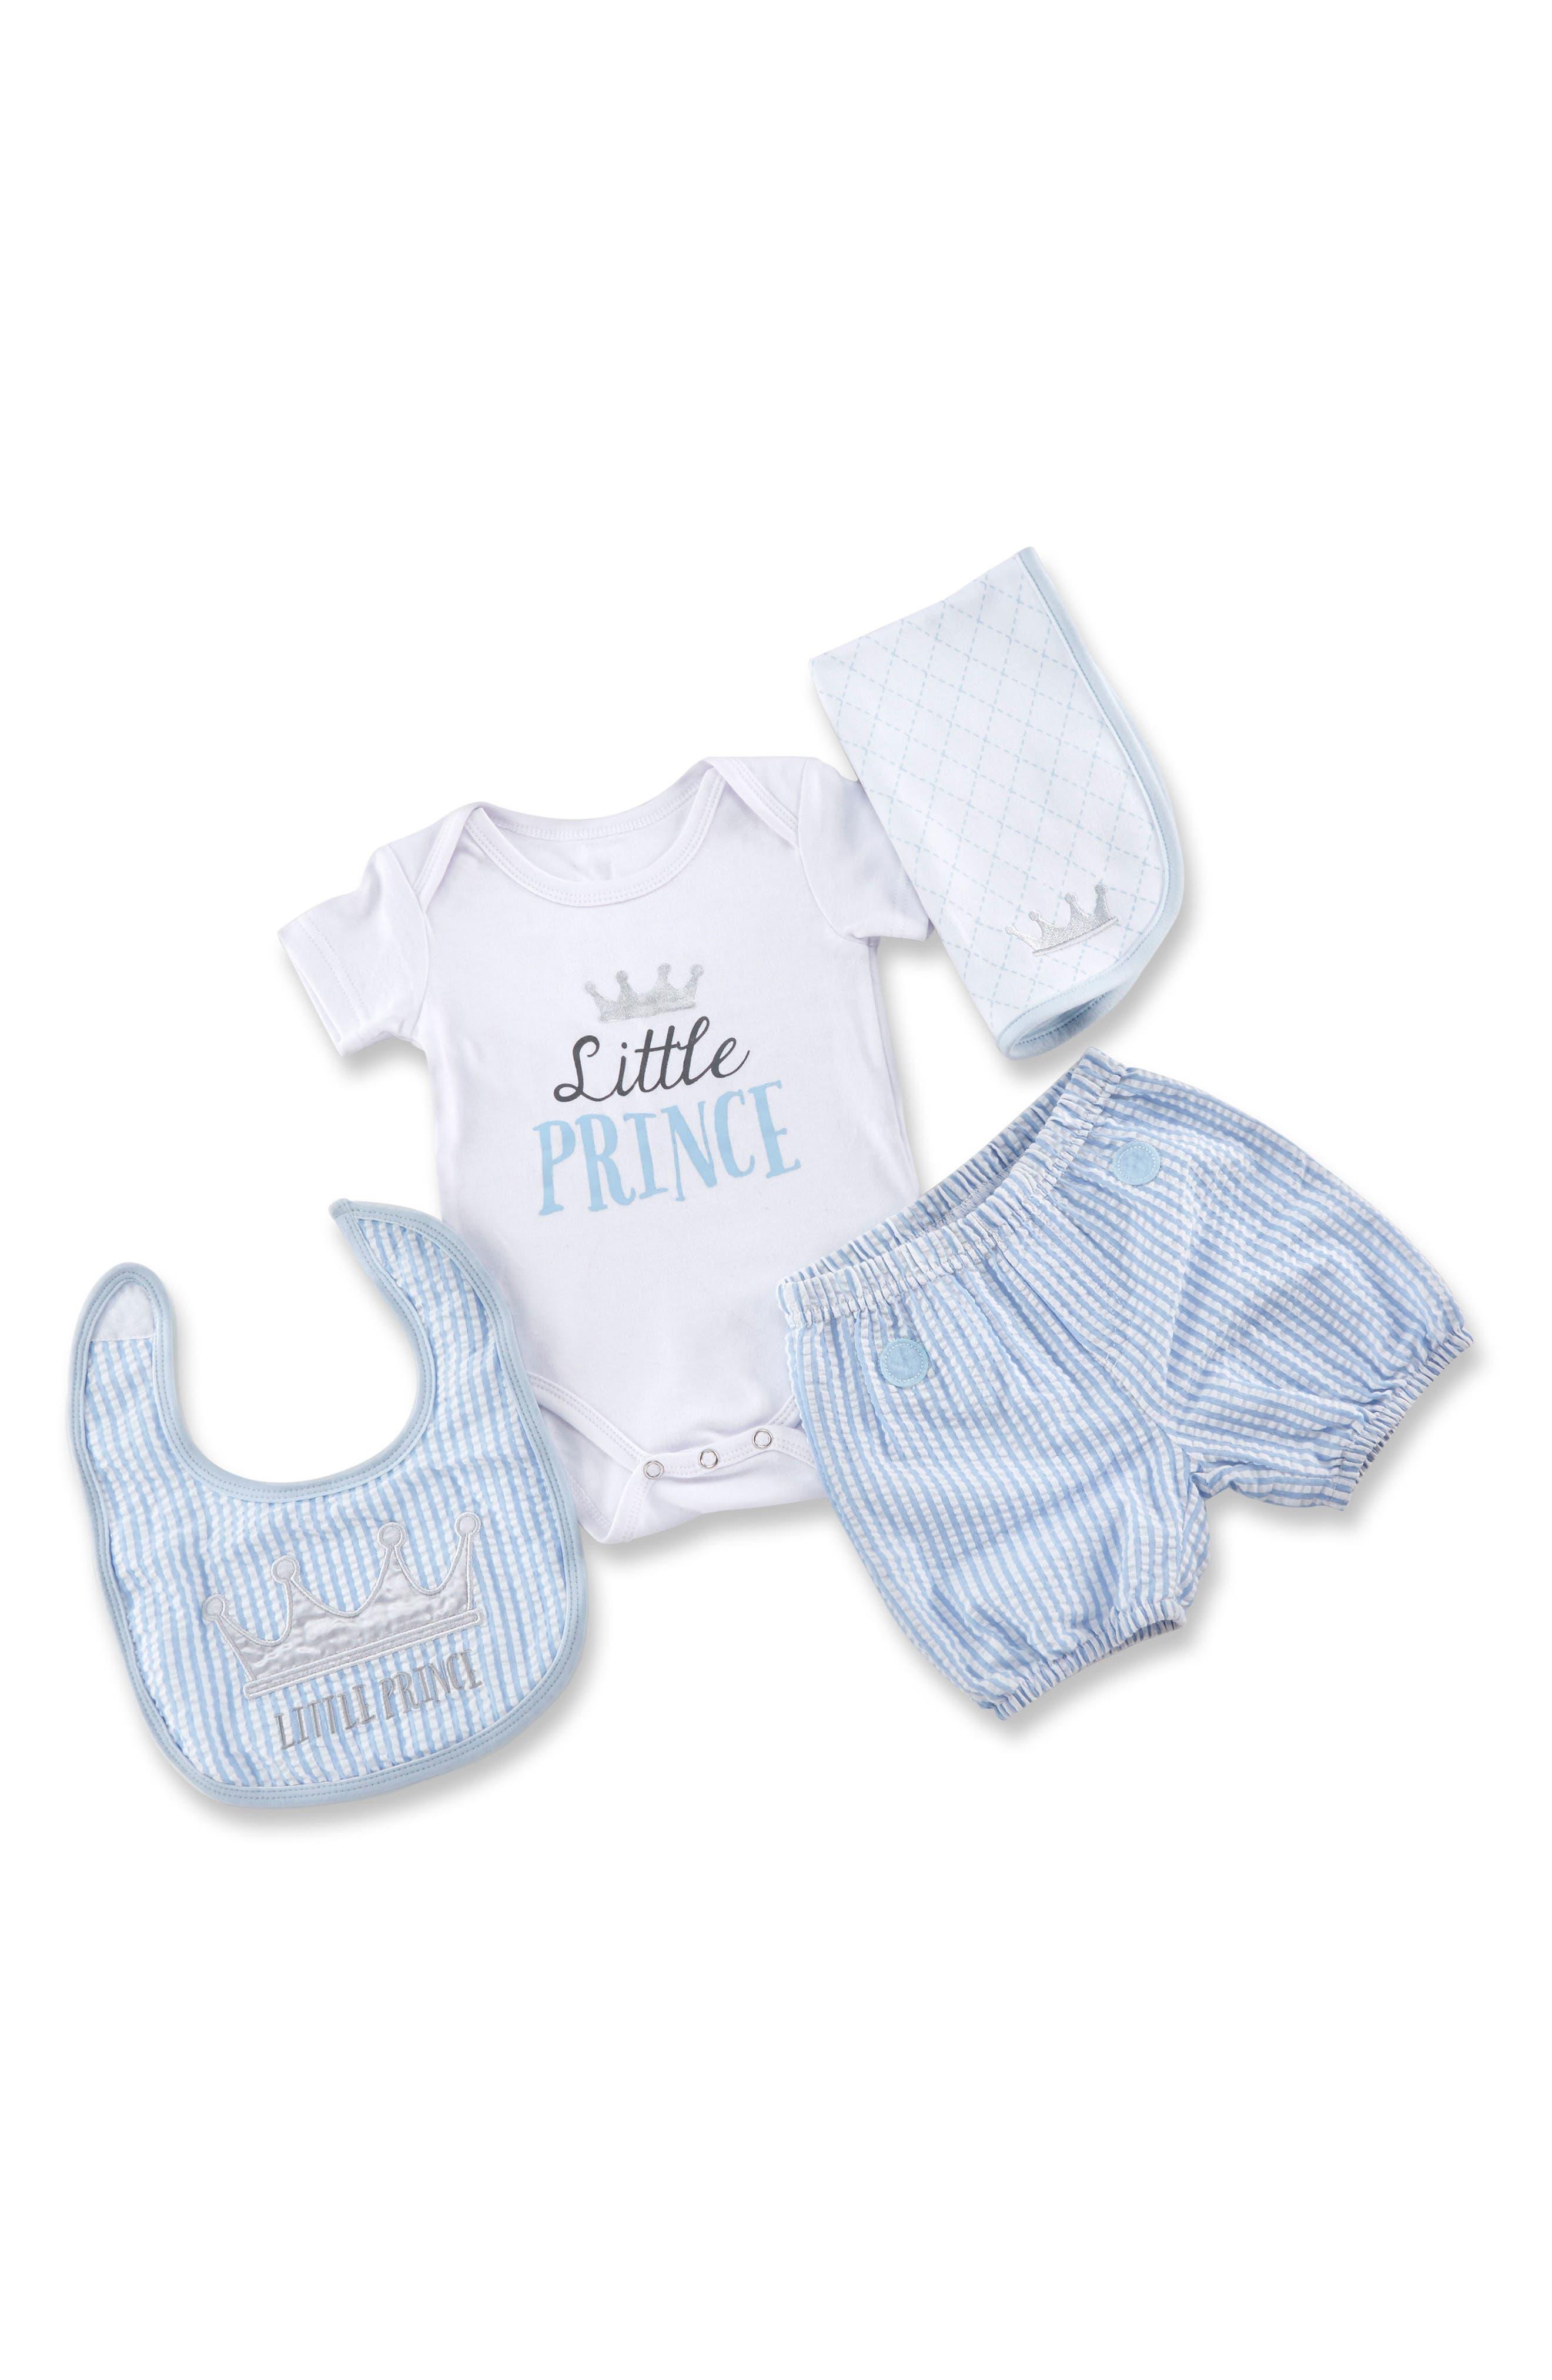 Alternate Image 1 Selected - Baby Aspen Little Prince Gift Set (Baby Boys)